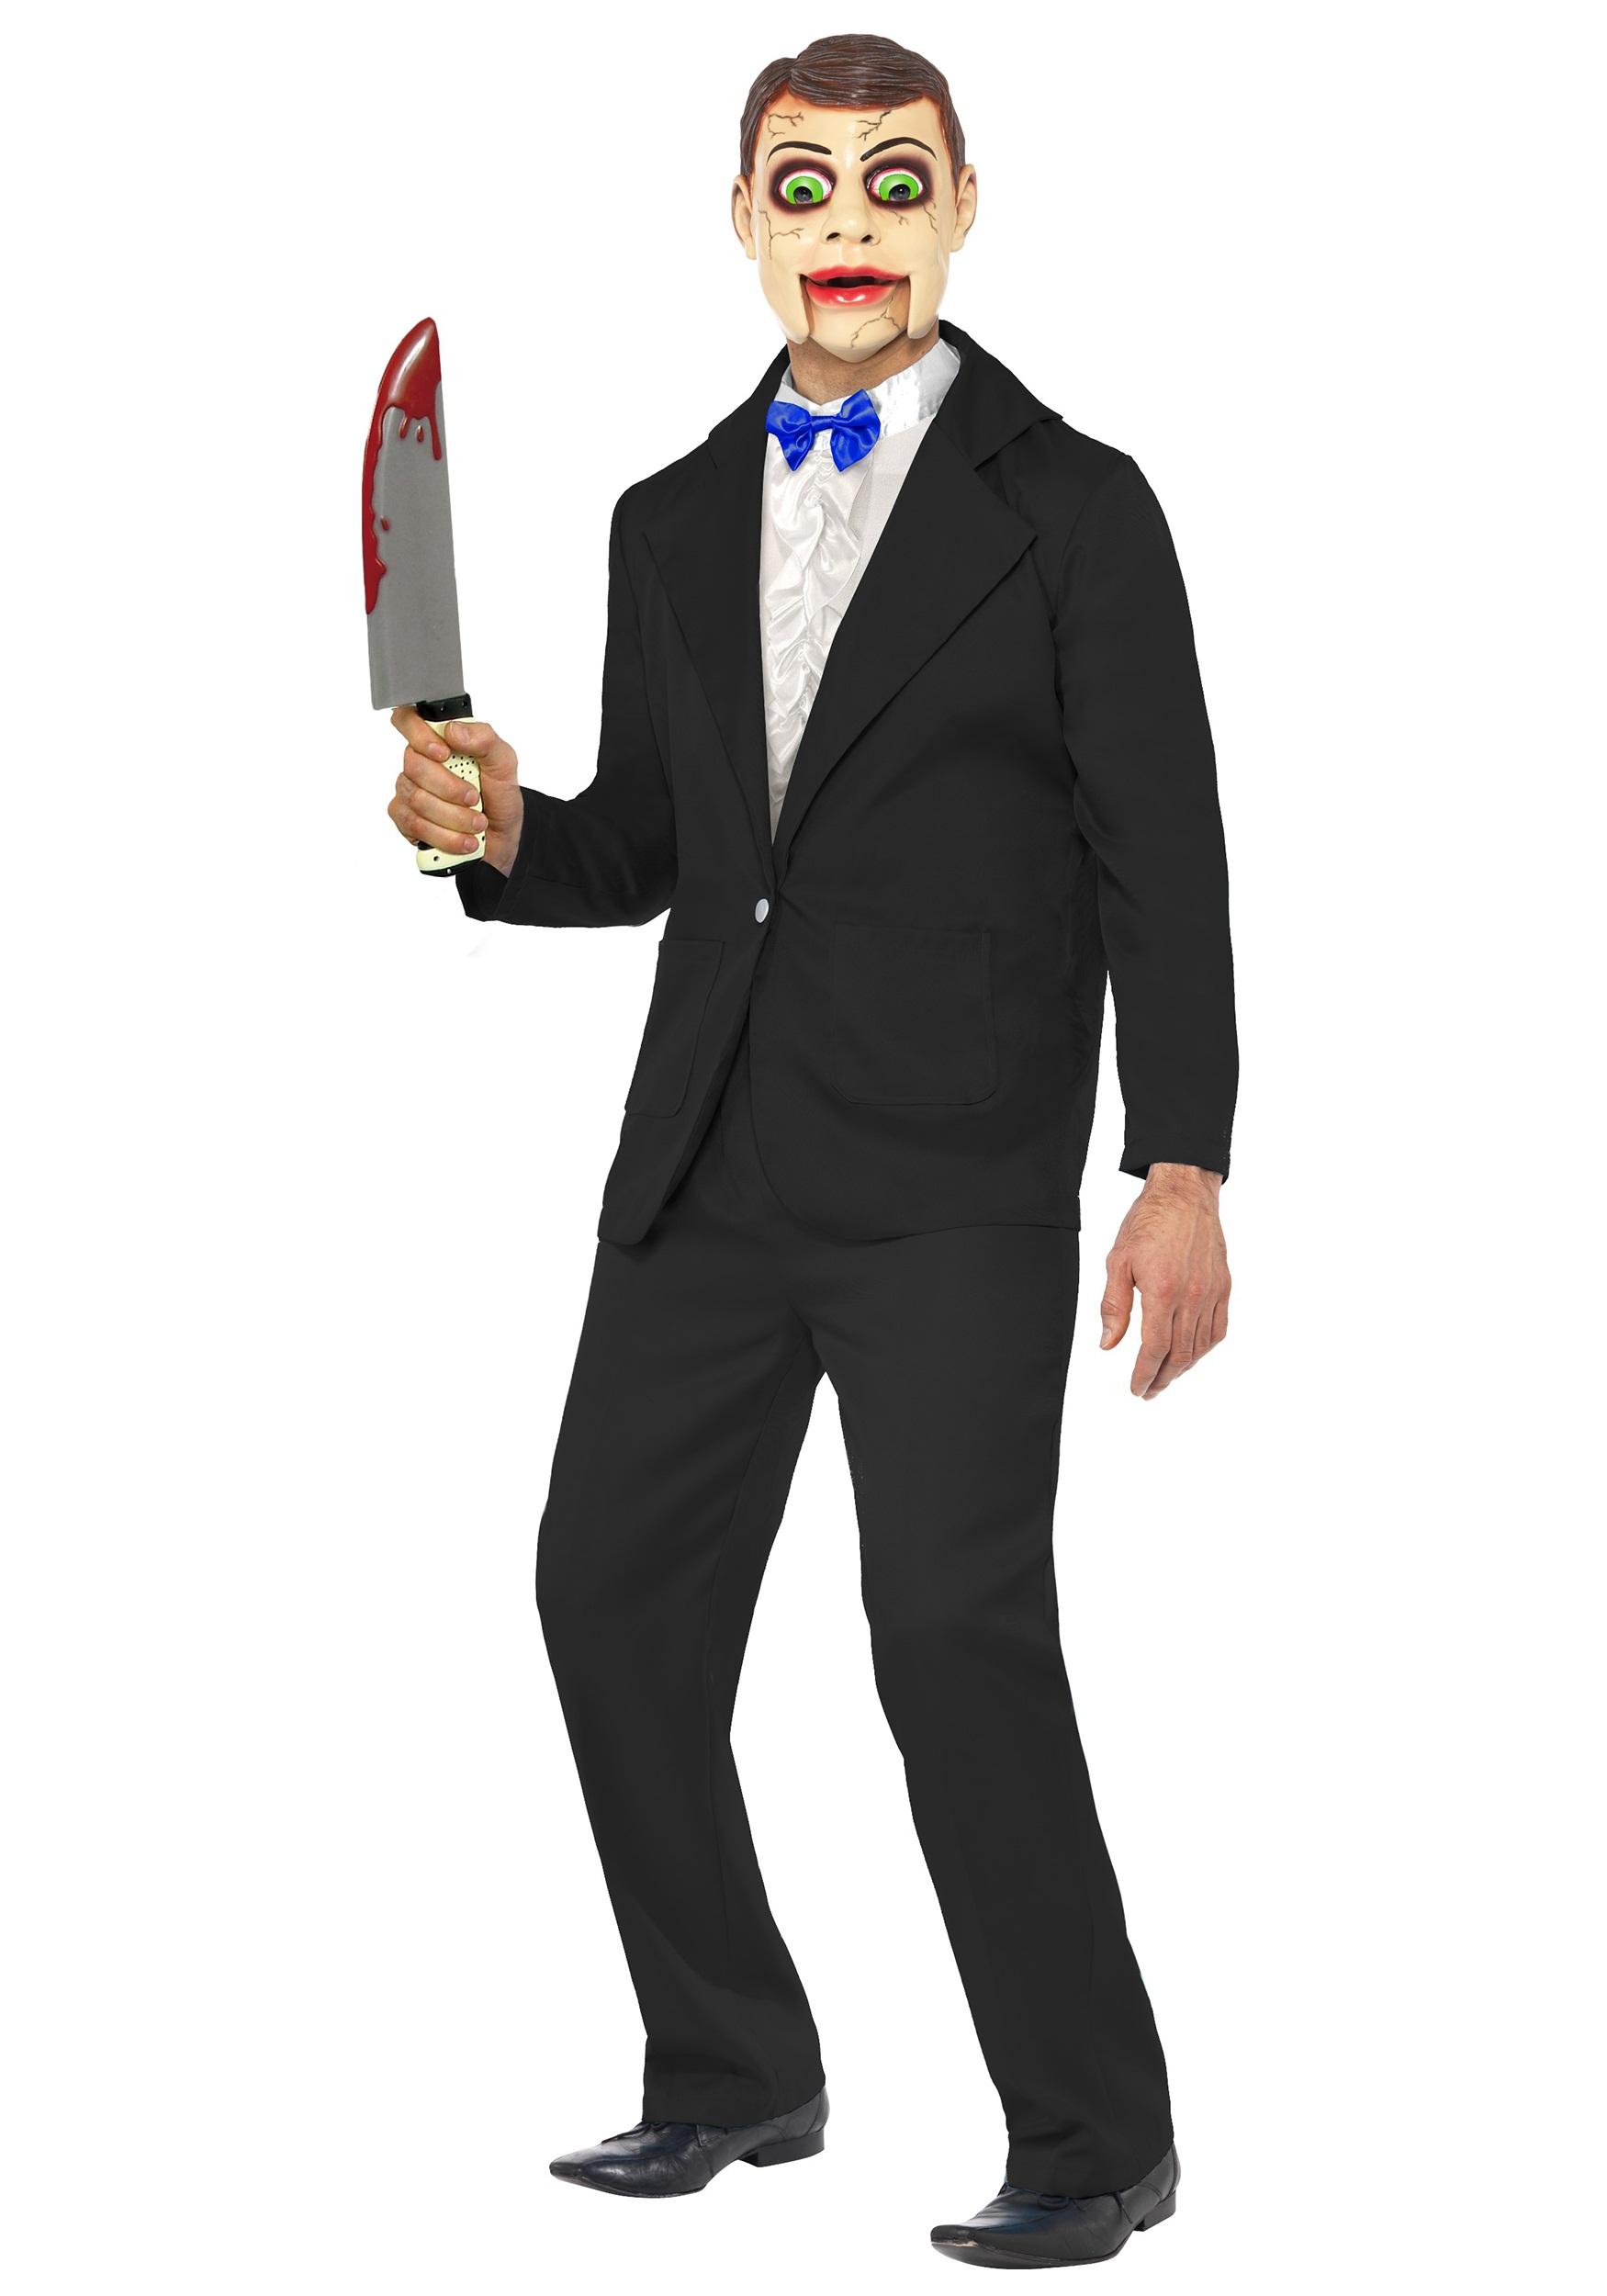 Halloween Costumes Scary Men.Men S Ventriloquist Dummy Costume